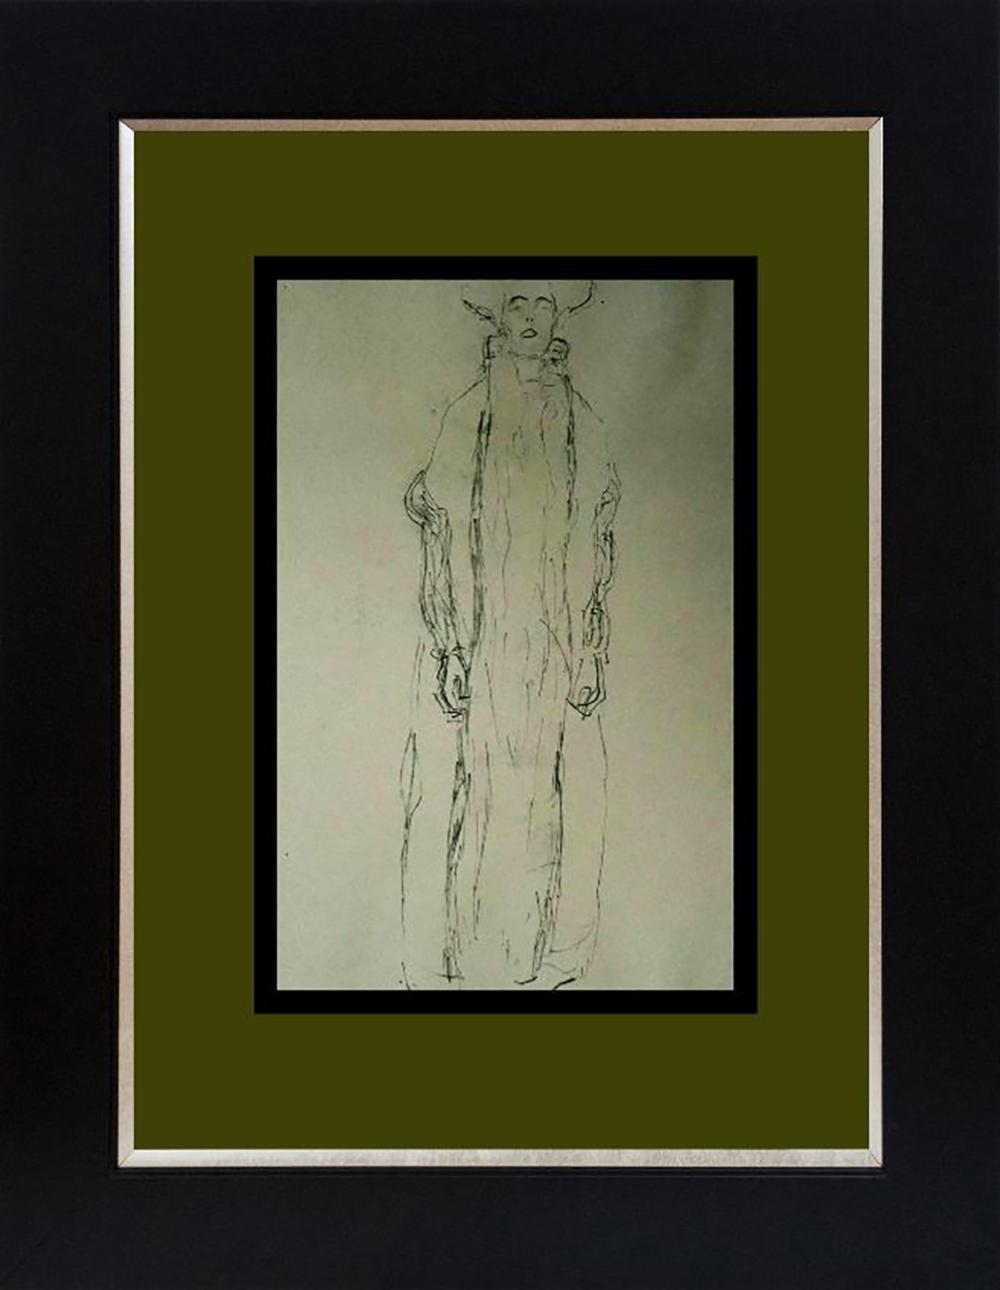 Gustav Klimt Lithograph from 1966